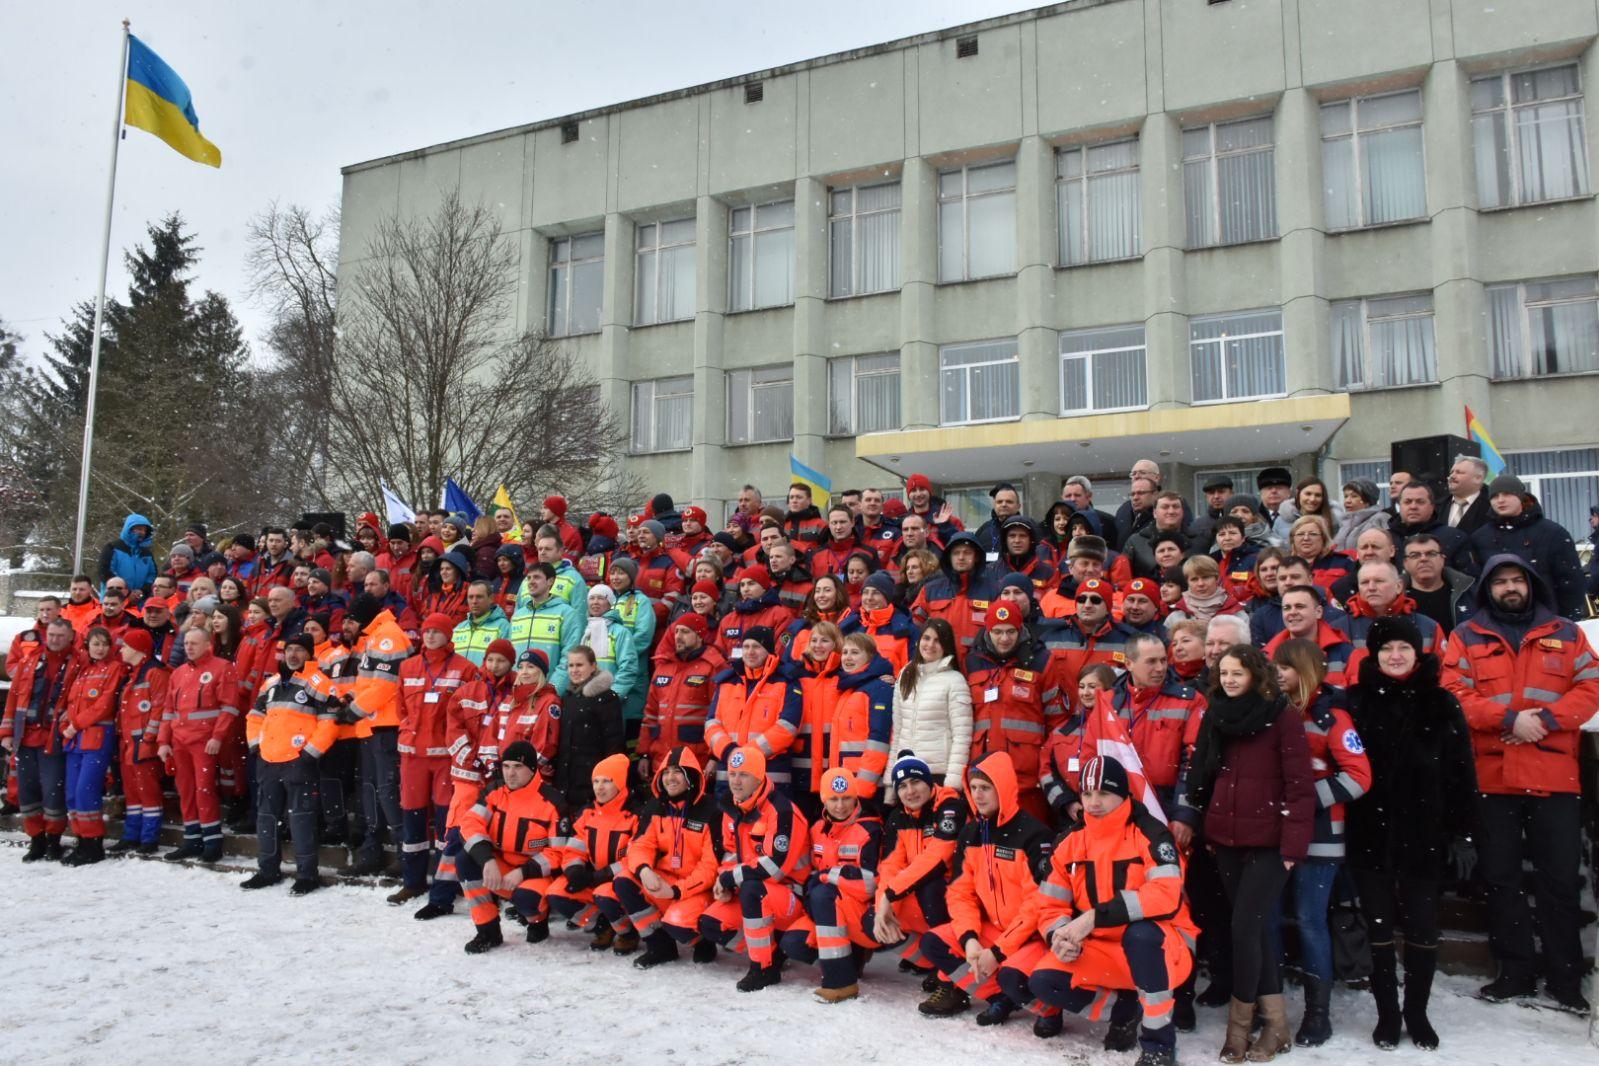 Kremenet Medical Rally, Février 2018